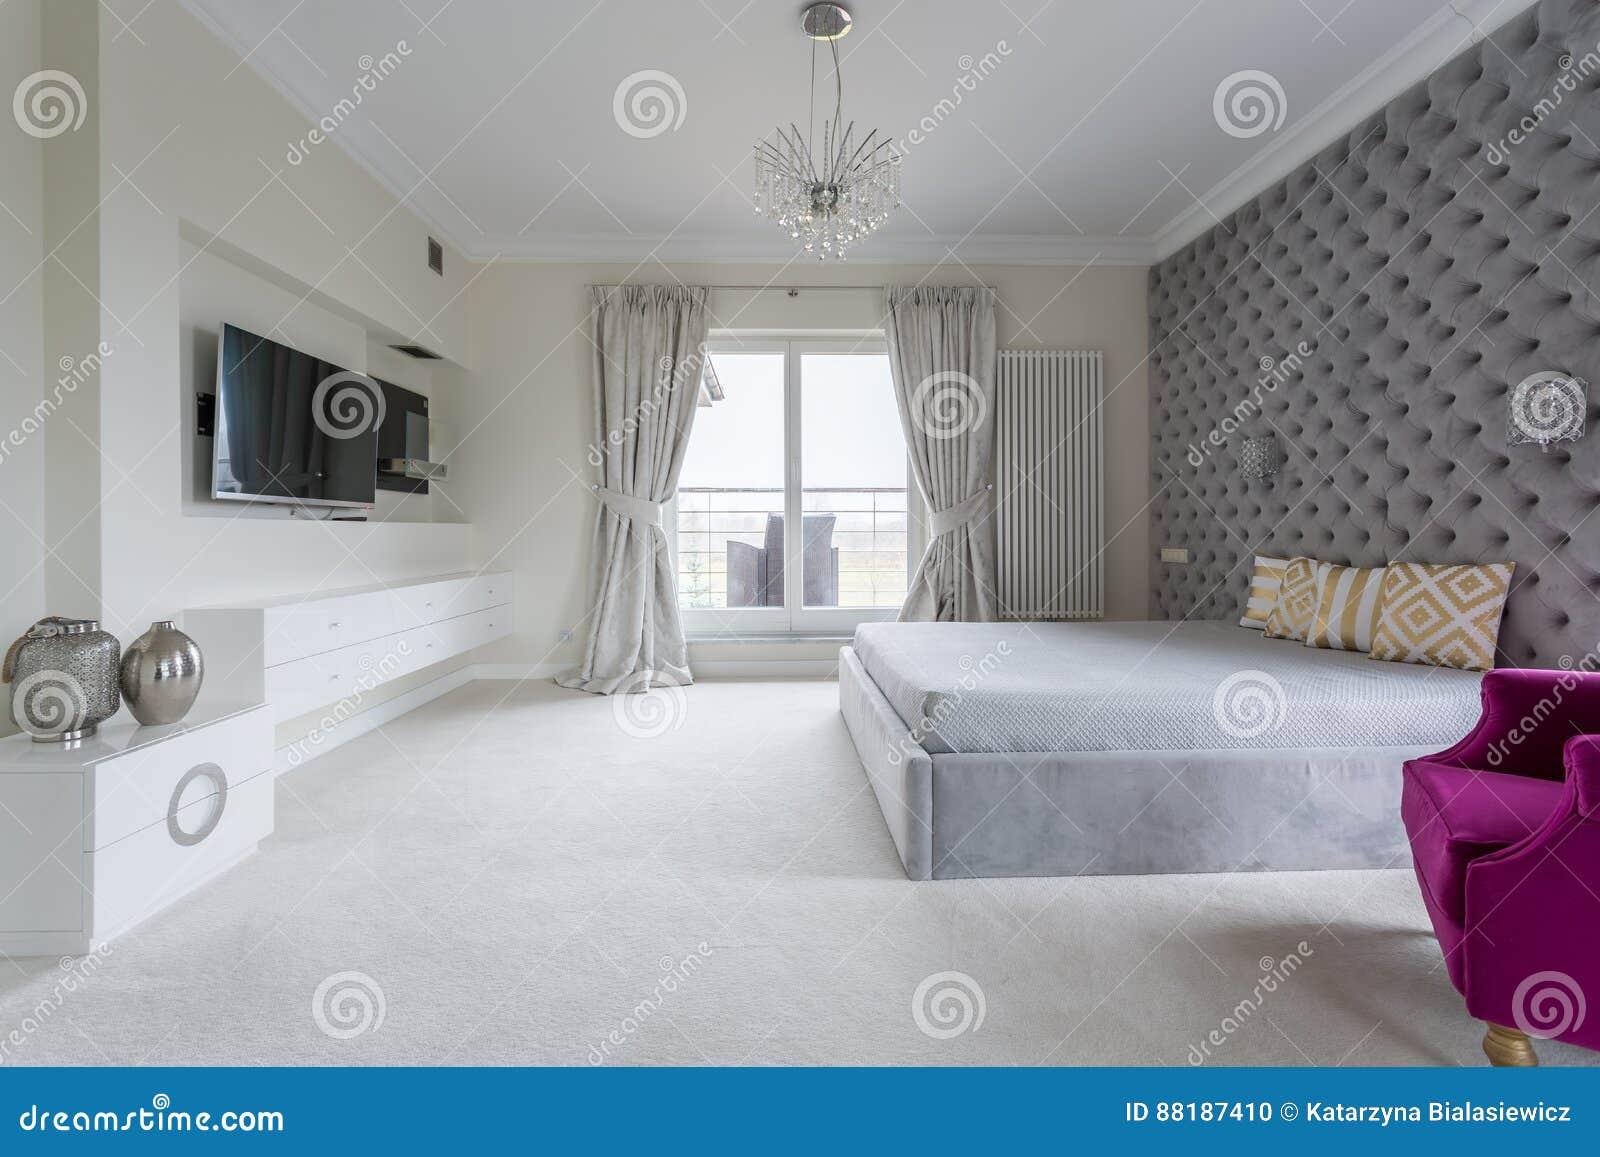 Chambre à Coucher Moderne Blanche Photo stock - Image du home ...